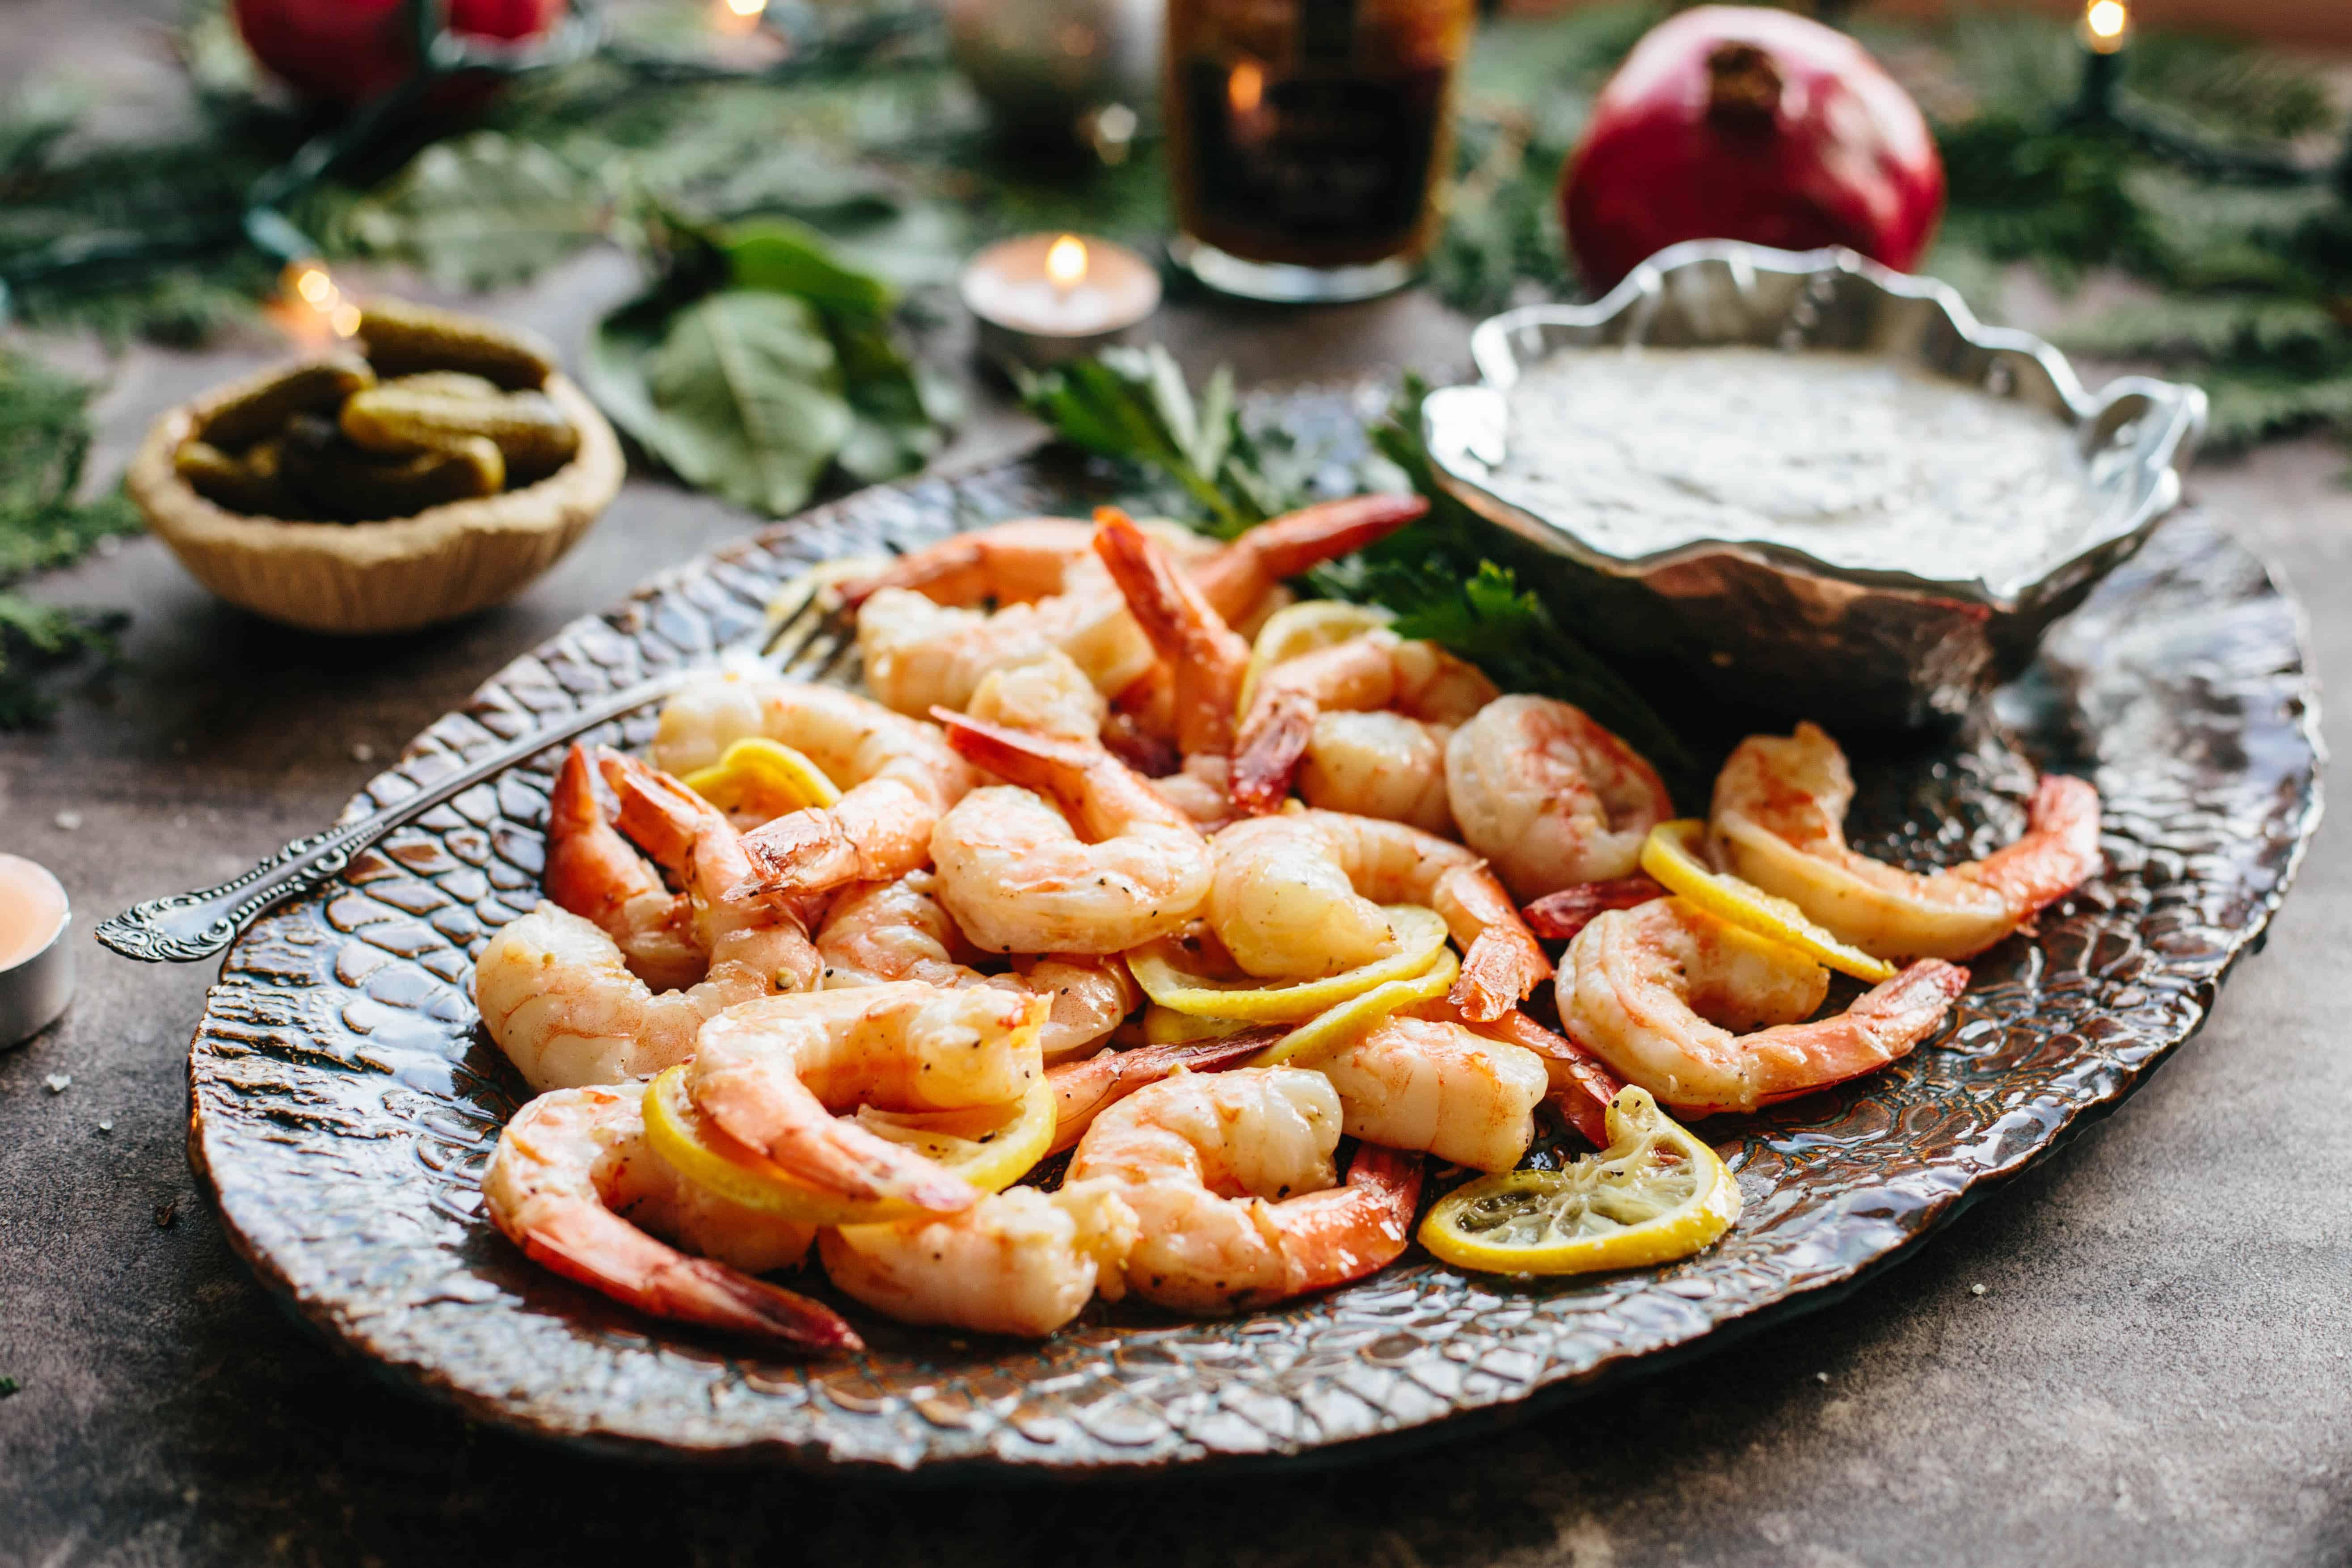 Roasted shrimp and sliced lemon on a platter.